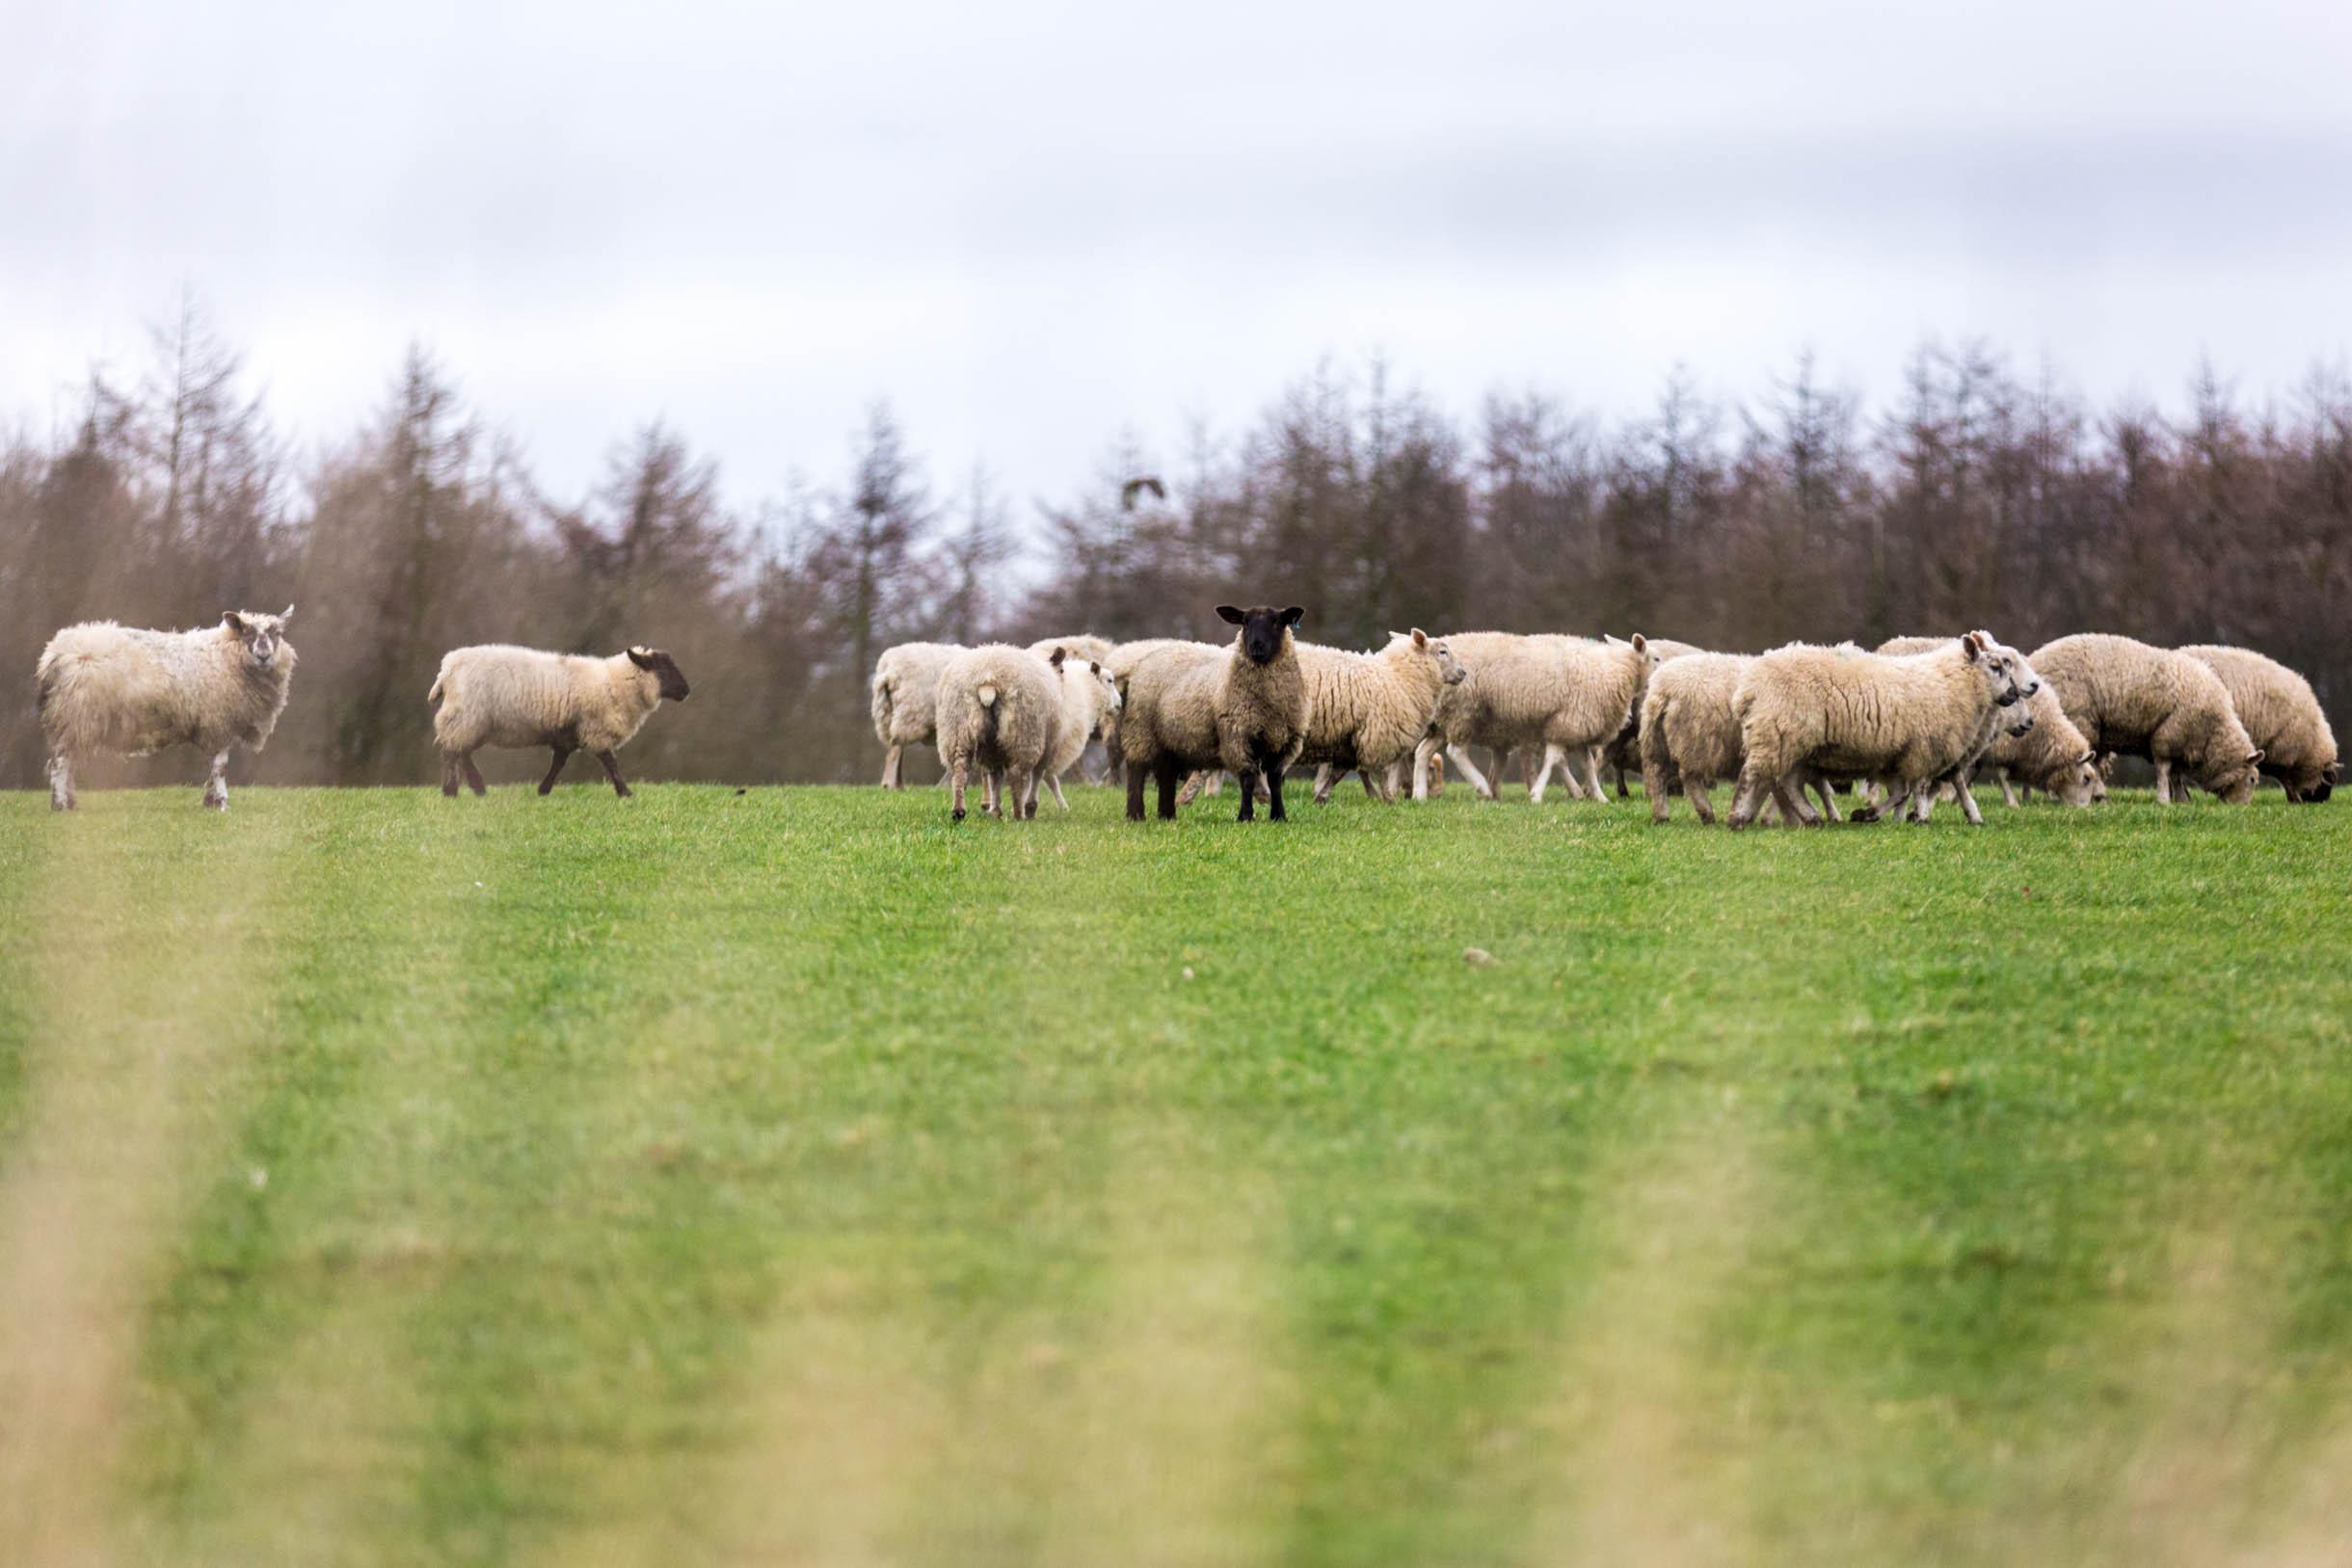 Sheep near st. andrews scotland